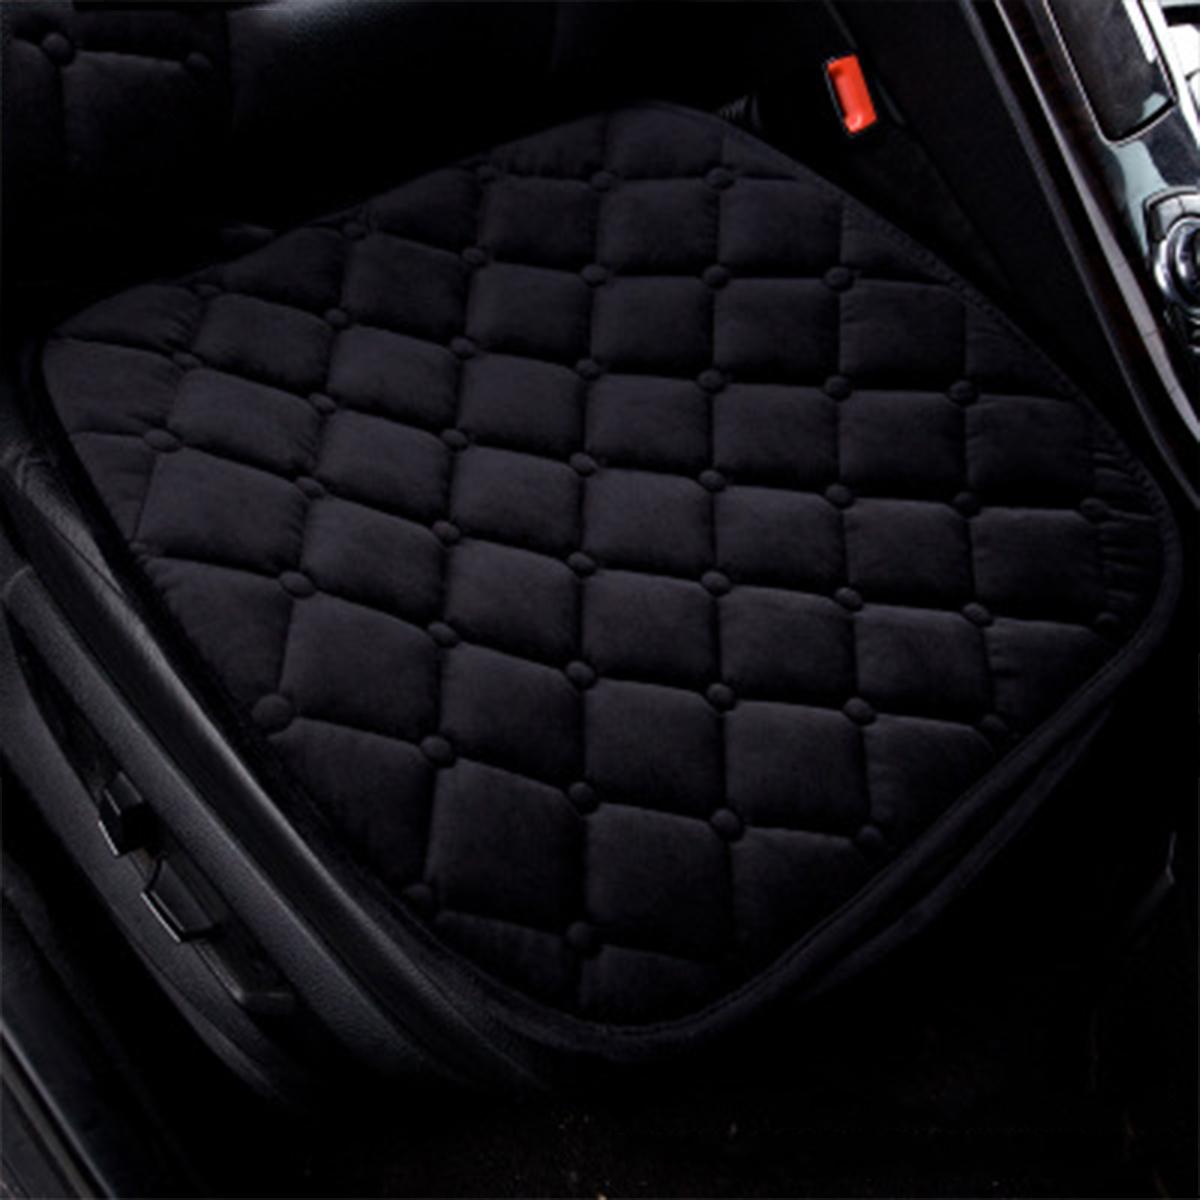 Universal Front Car Cushion Short Fleece Fabric Seat Cover Cushion Comfortable Protection Pad Mat Warmer Pad